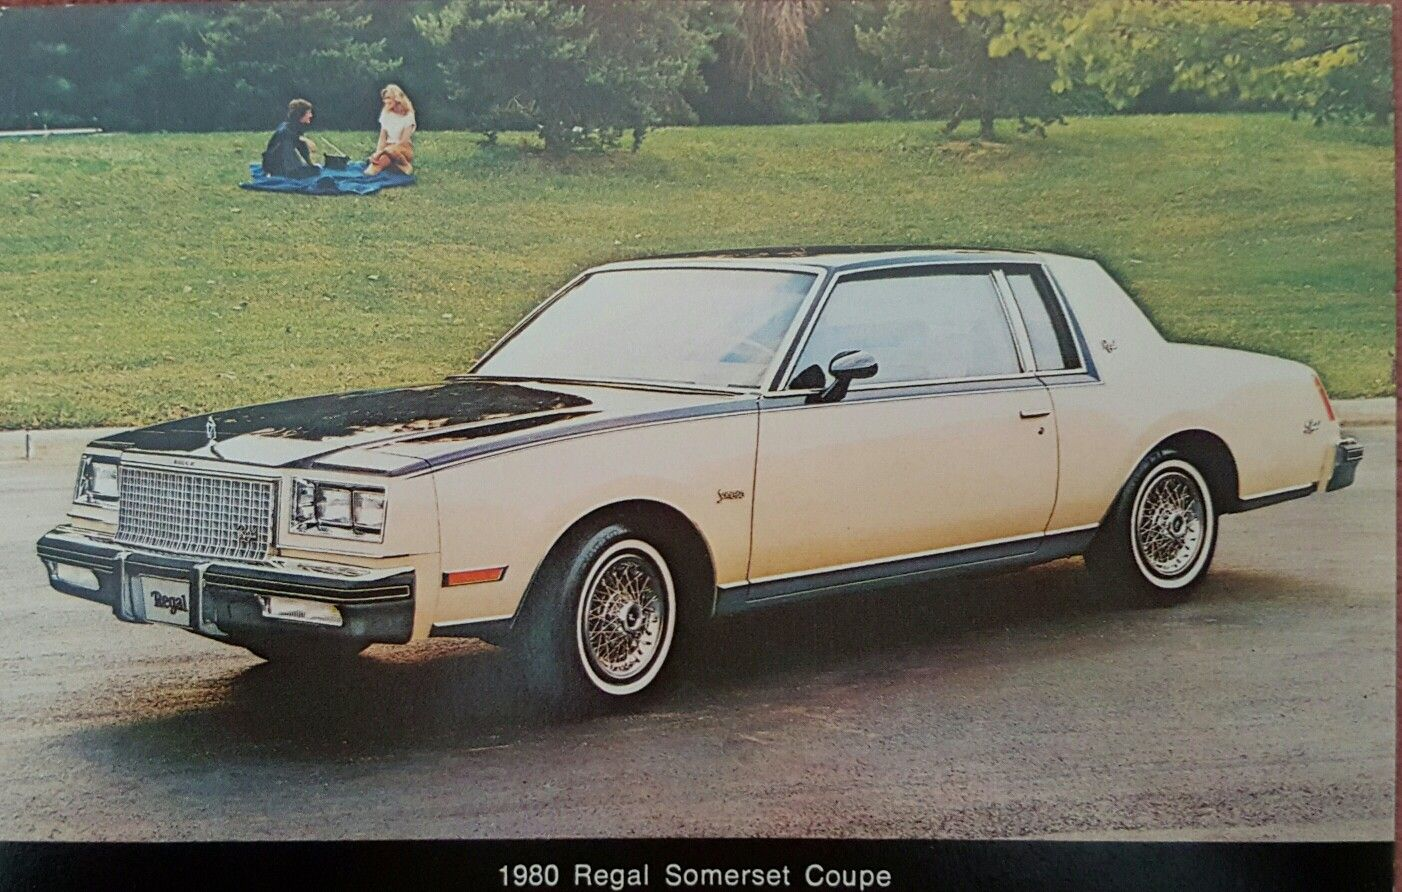 1980 buick regal somerset coupe [ 1402 x 892 Pixel ]